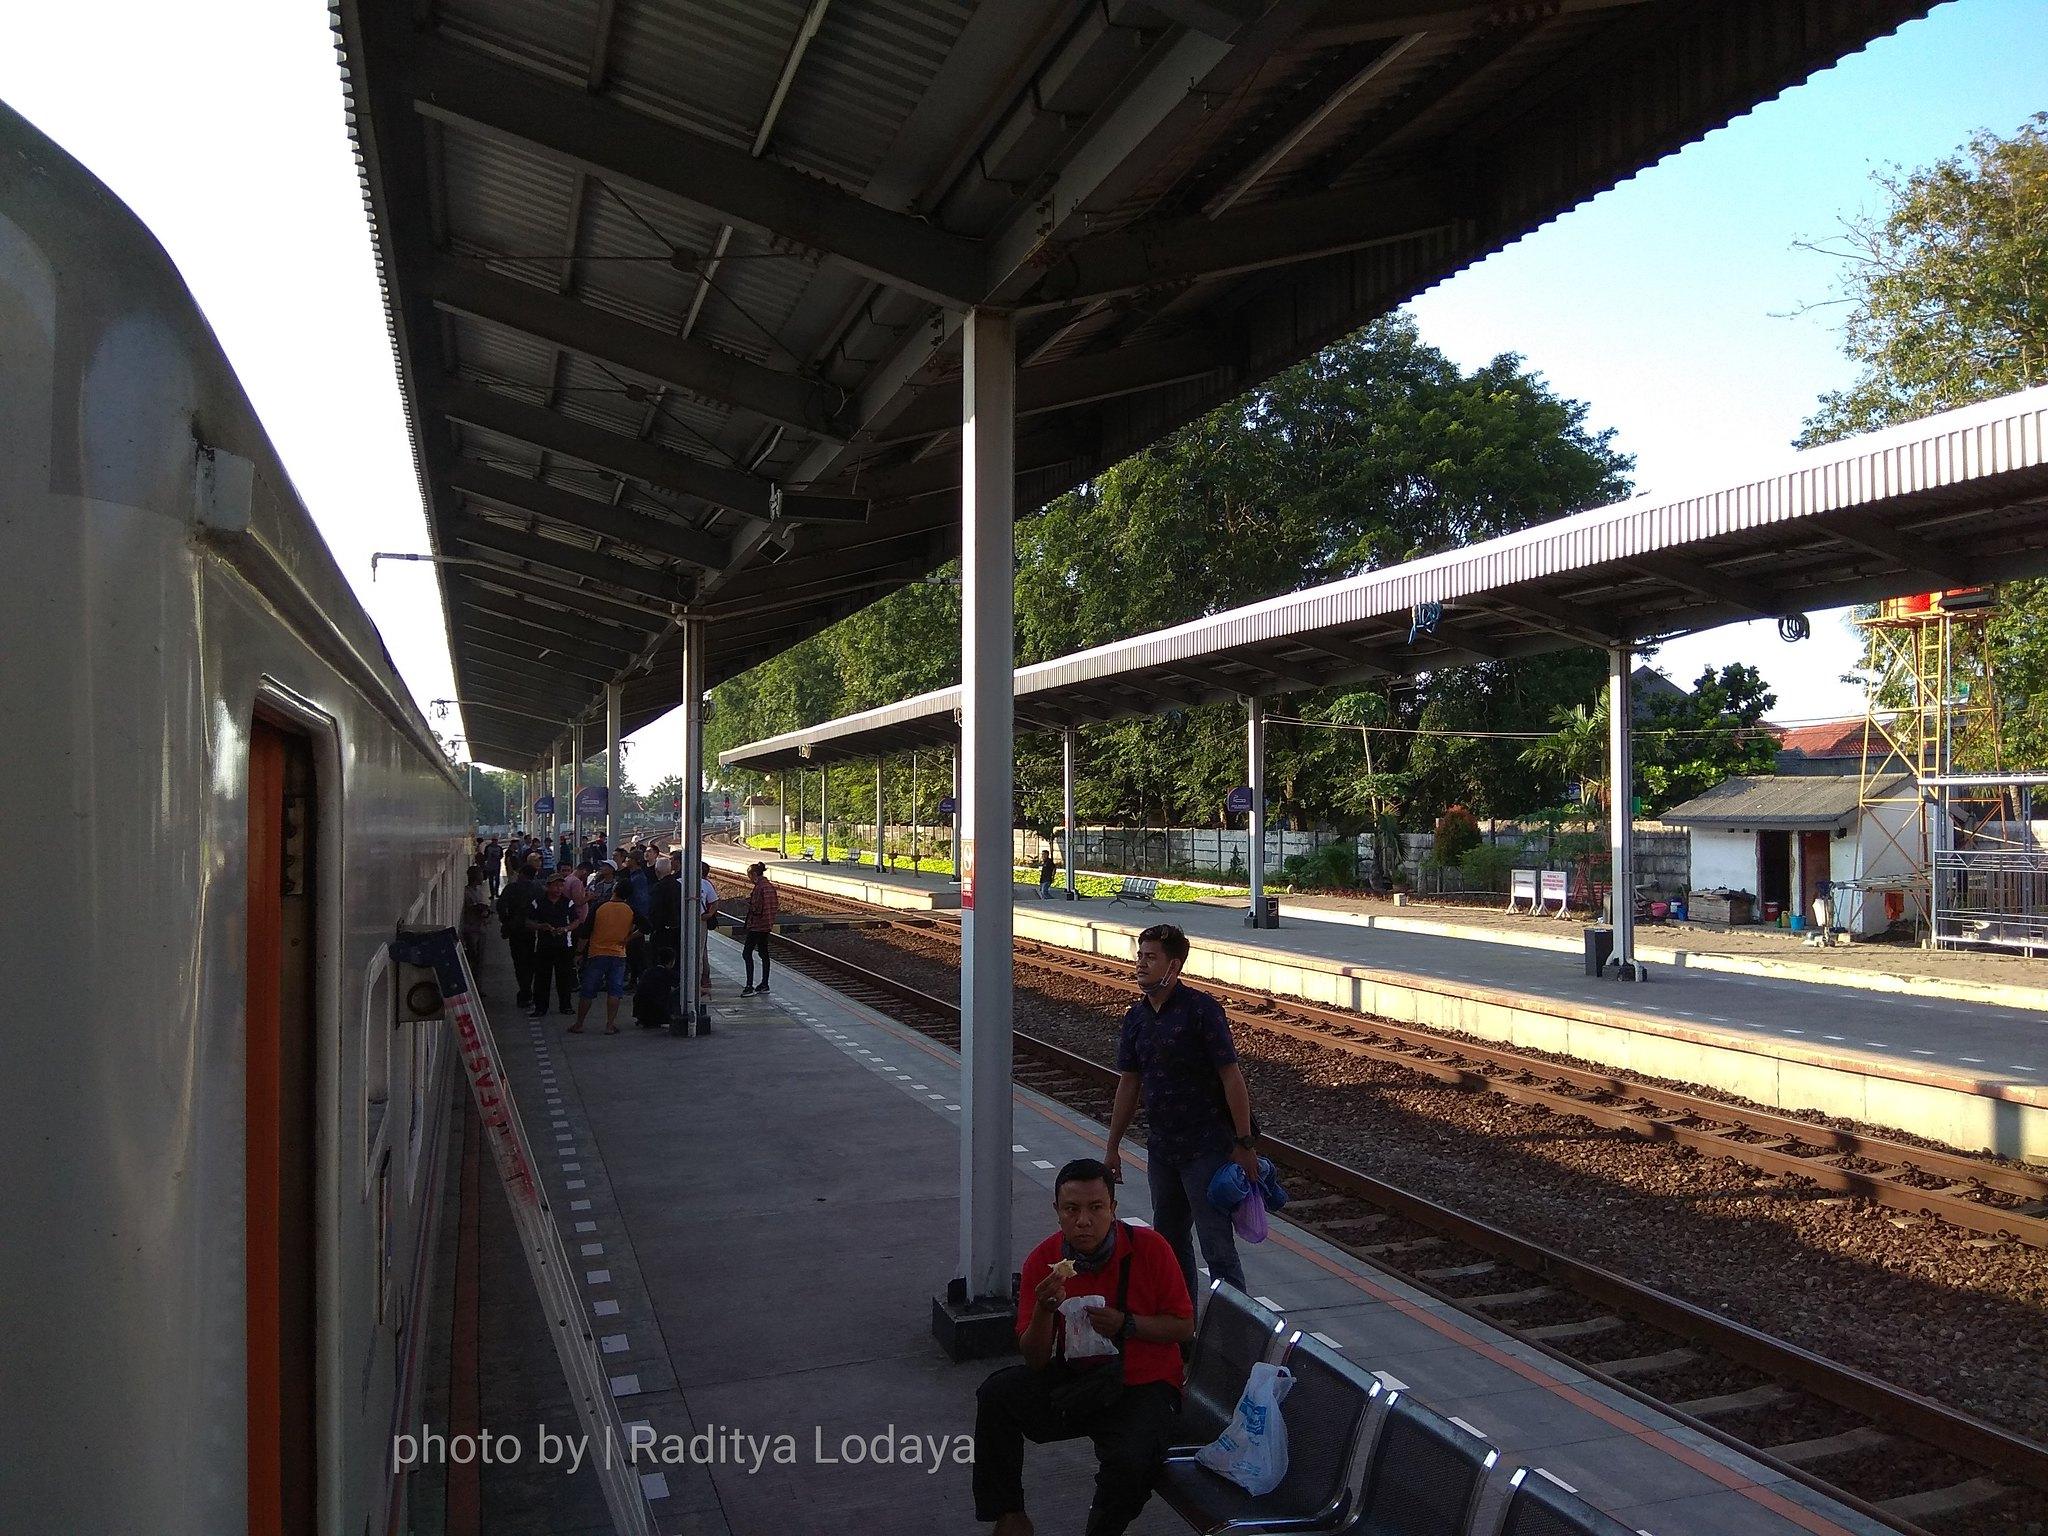 28 TRIP REPORT KERETA API JAYABAYA 1 (JAKARTA-CIREBON) -- STASIUN CIREBON PRUJAKAN 2